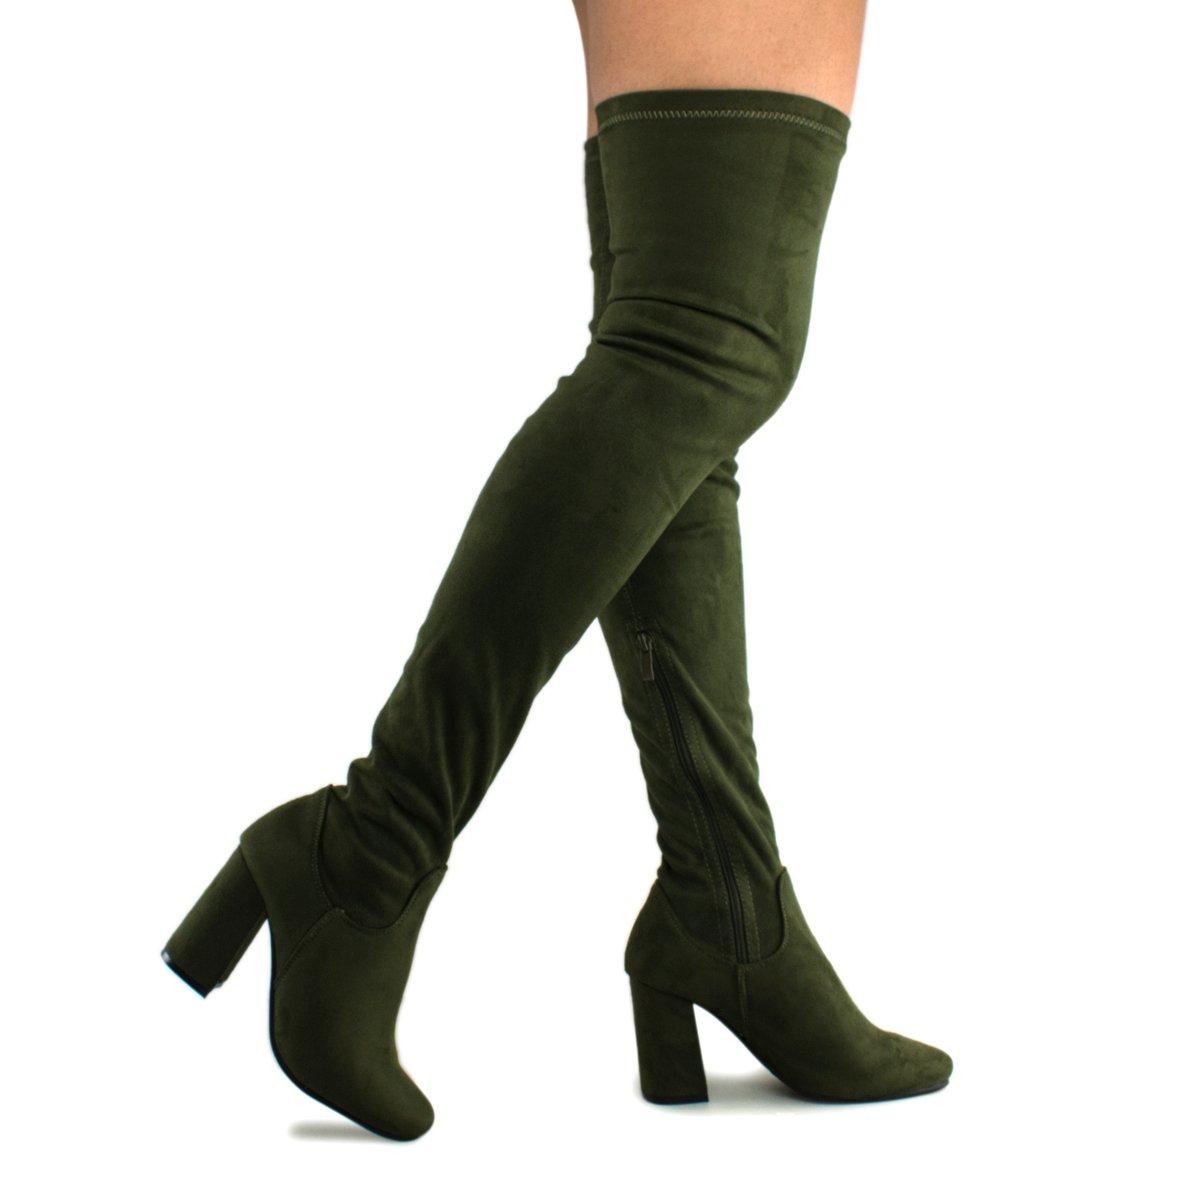 Premier Standard Women Fashion Comfy Vegan Suede Block Heel Slip On Thigh High Over The Knee Boots, TPS Elantra-01 v2 Olive Size 8